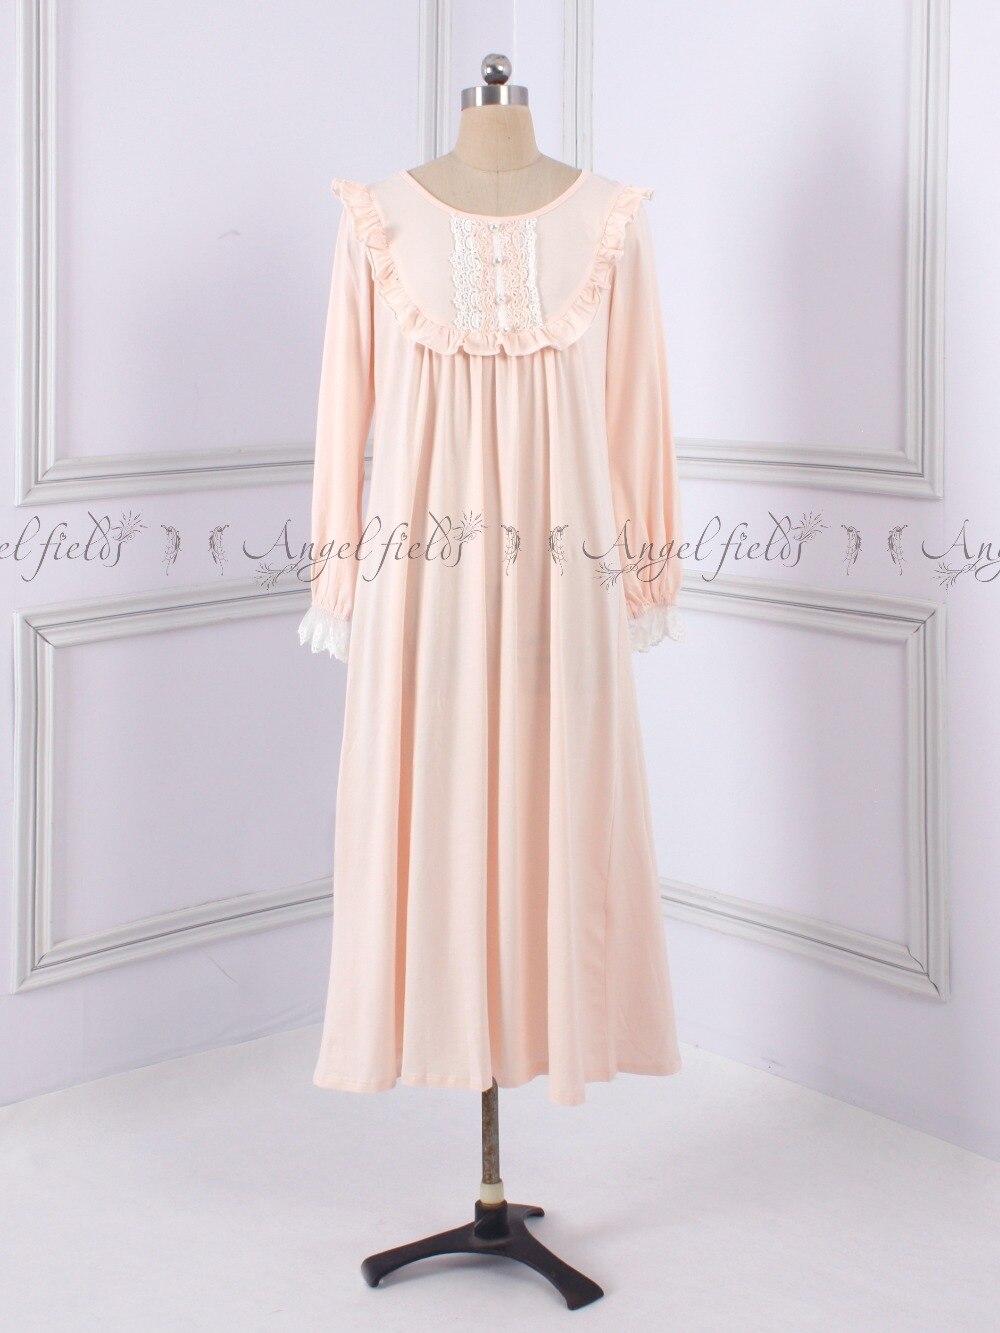 retro sweet lolita falbala lively lace lovely victorian dress kawaii girl pink lolita dress cosplay loli op gothic lolita